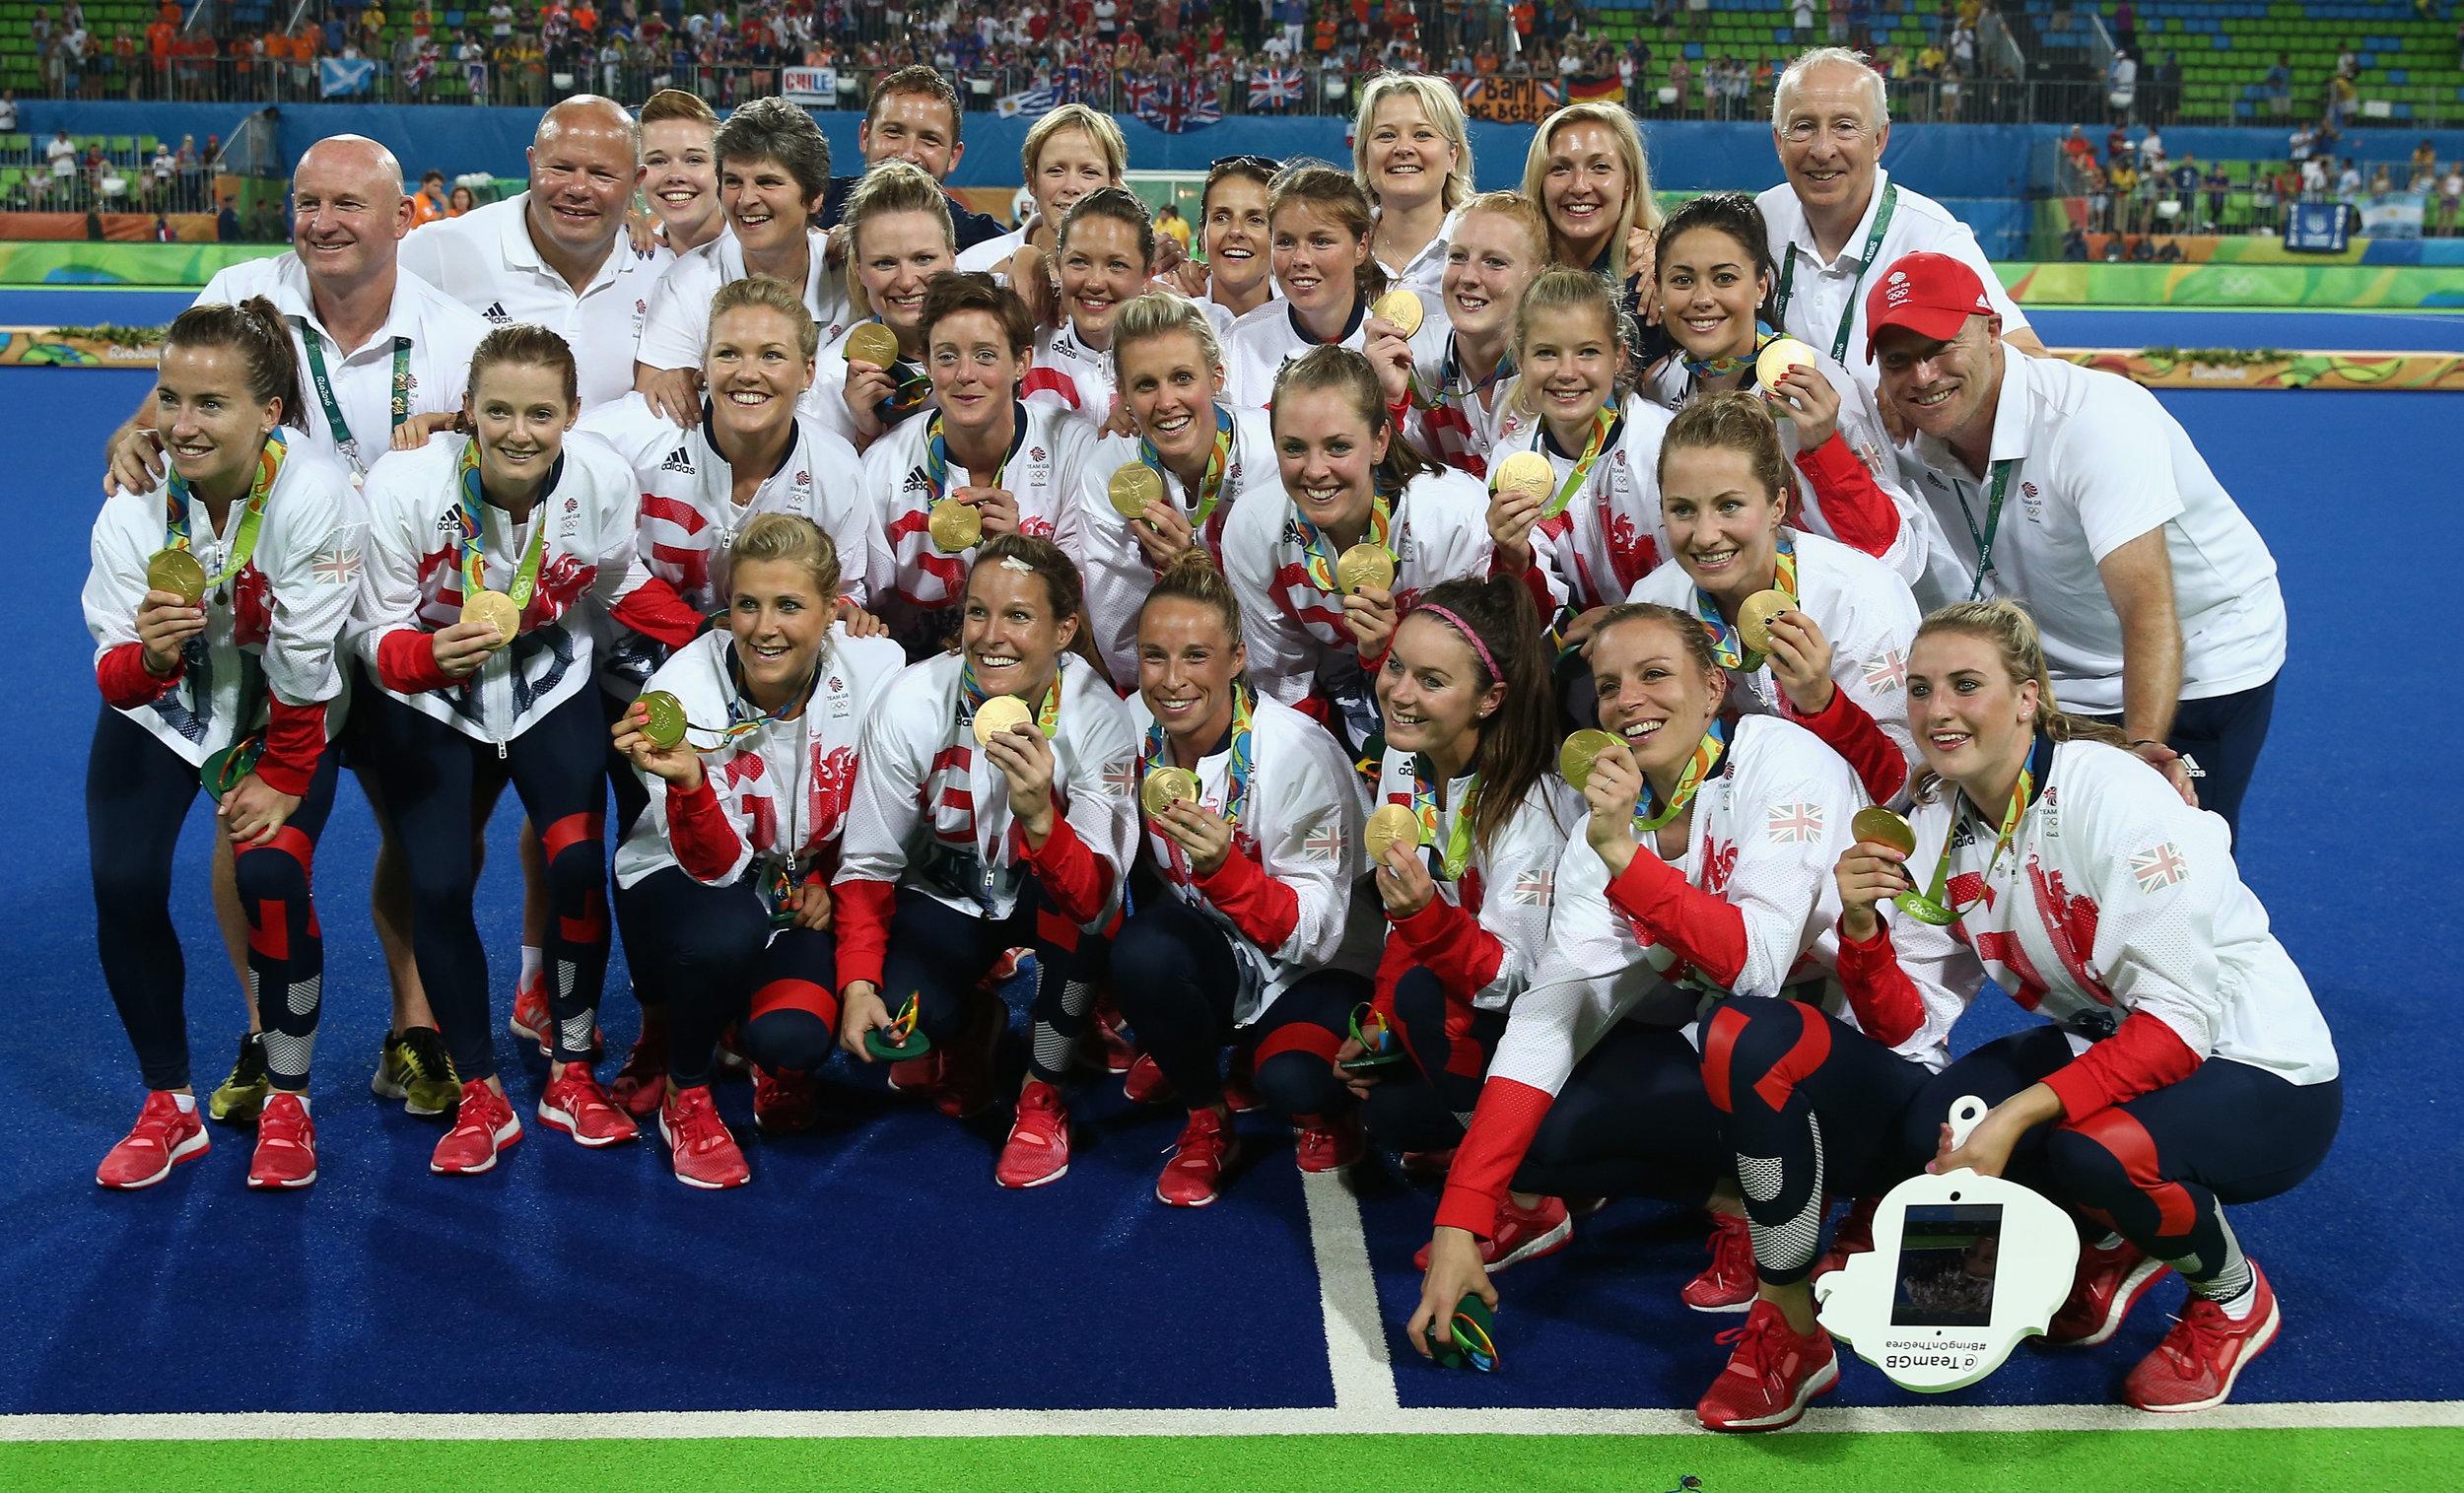 Crista cullen GB hockey gold medal Rio 2016.jpg